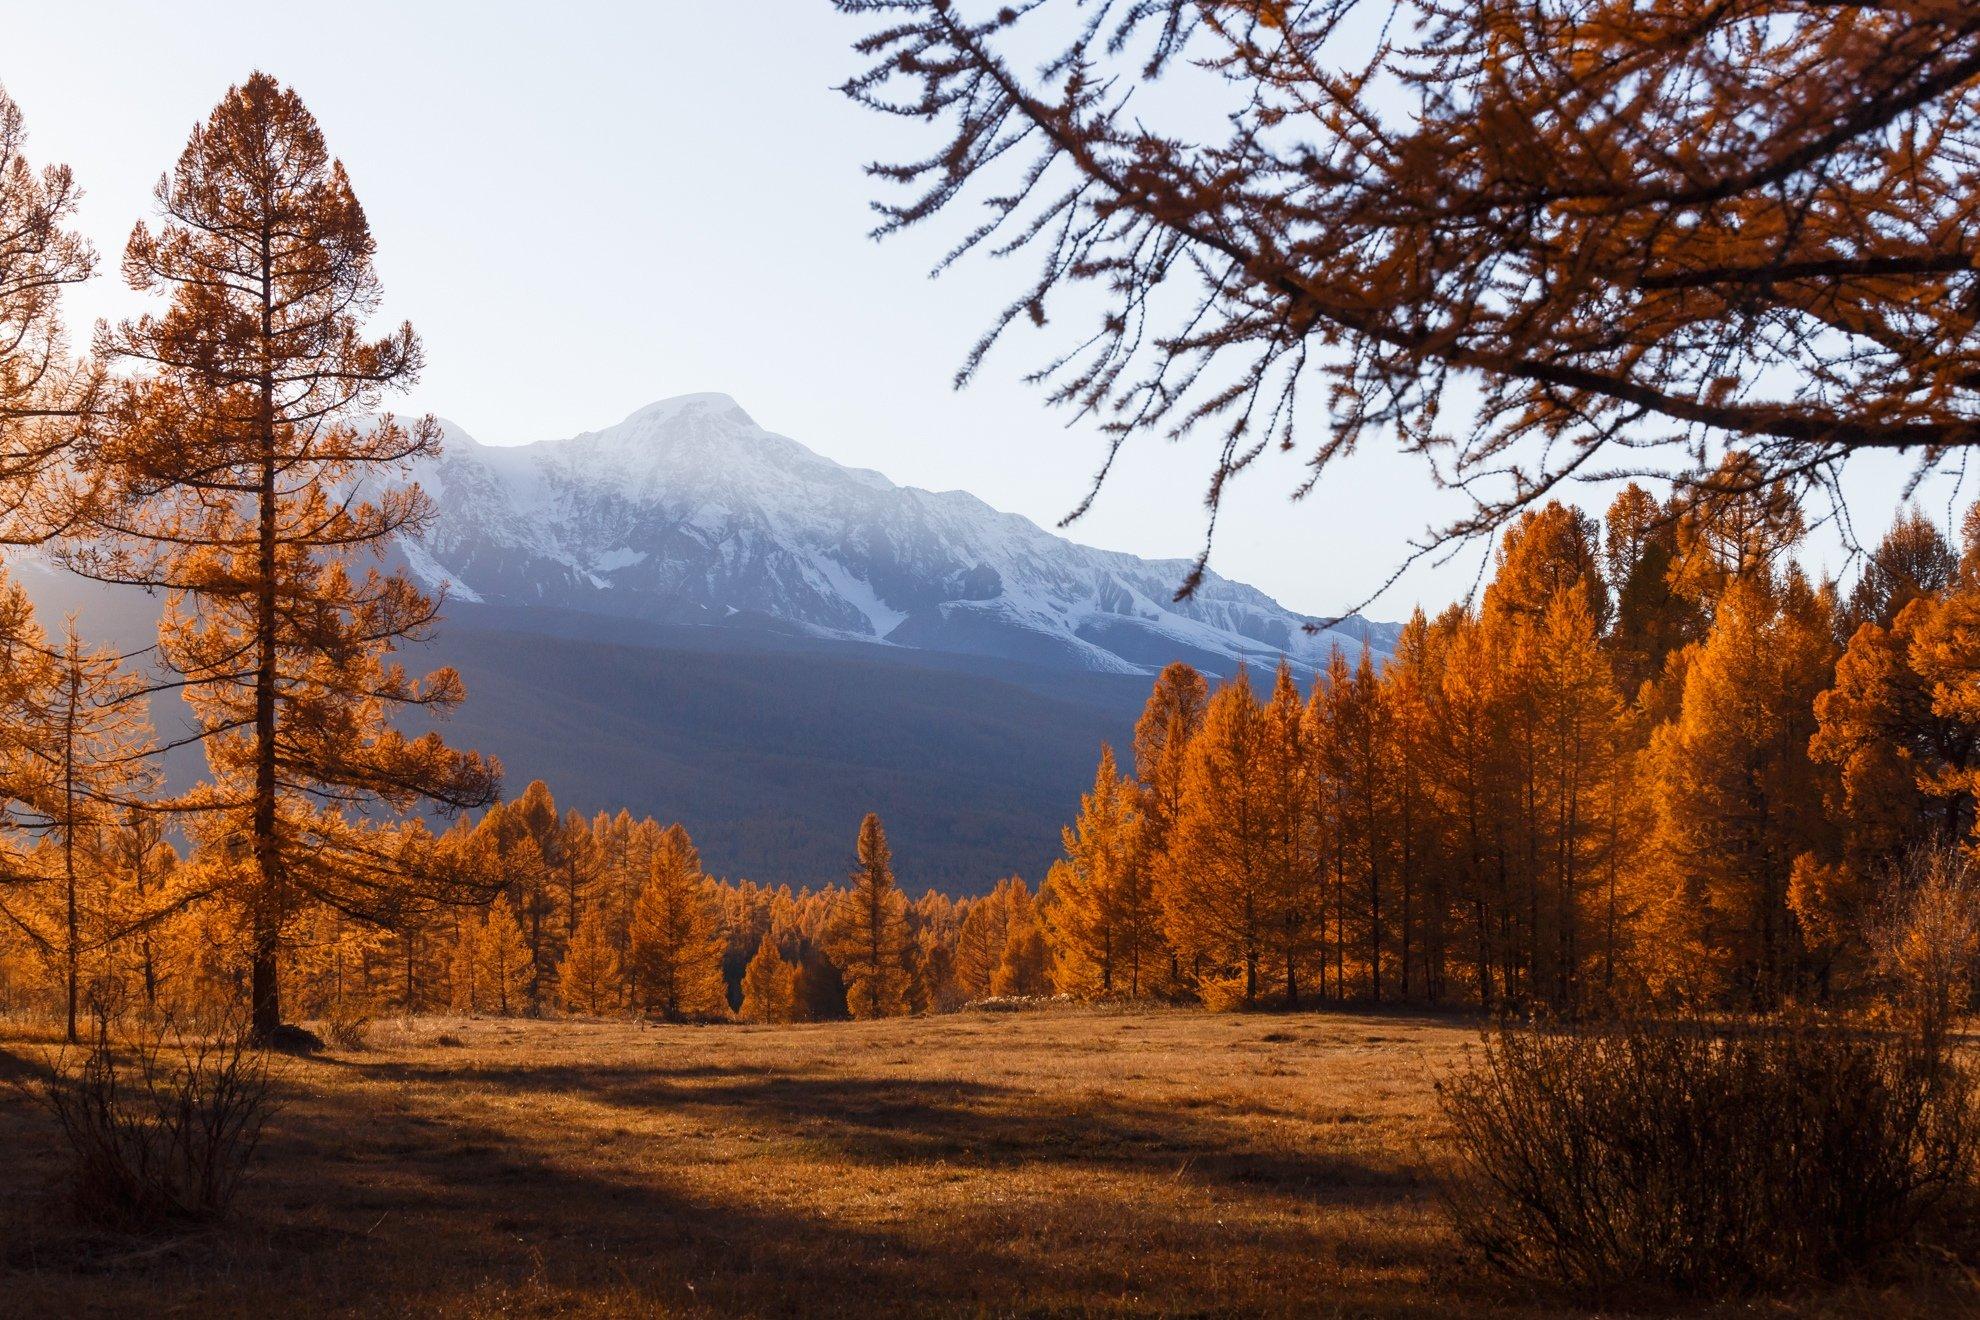 природа, алтай, горы, лес, осень, закат, солнце, nature, sunset, mountains, forest, autumn, light, Станислав Попов